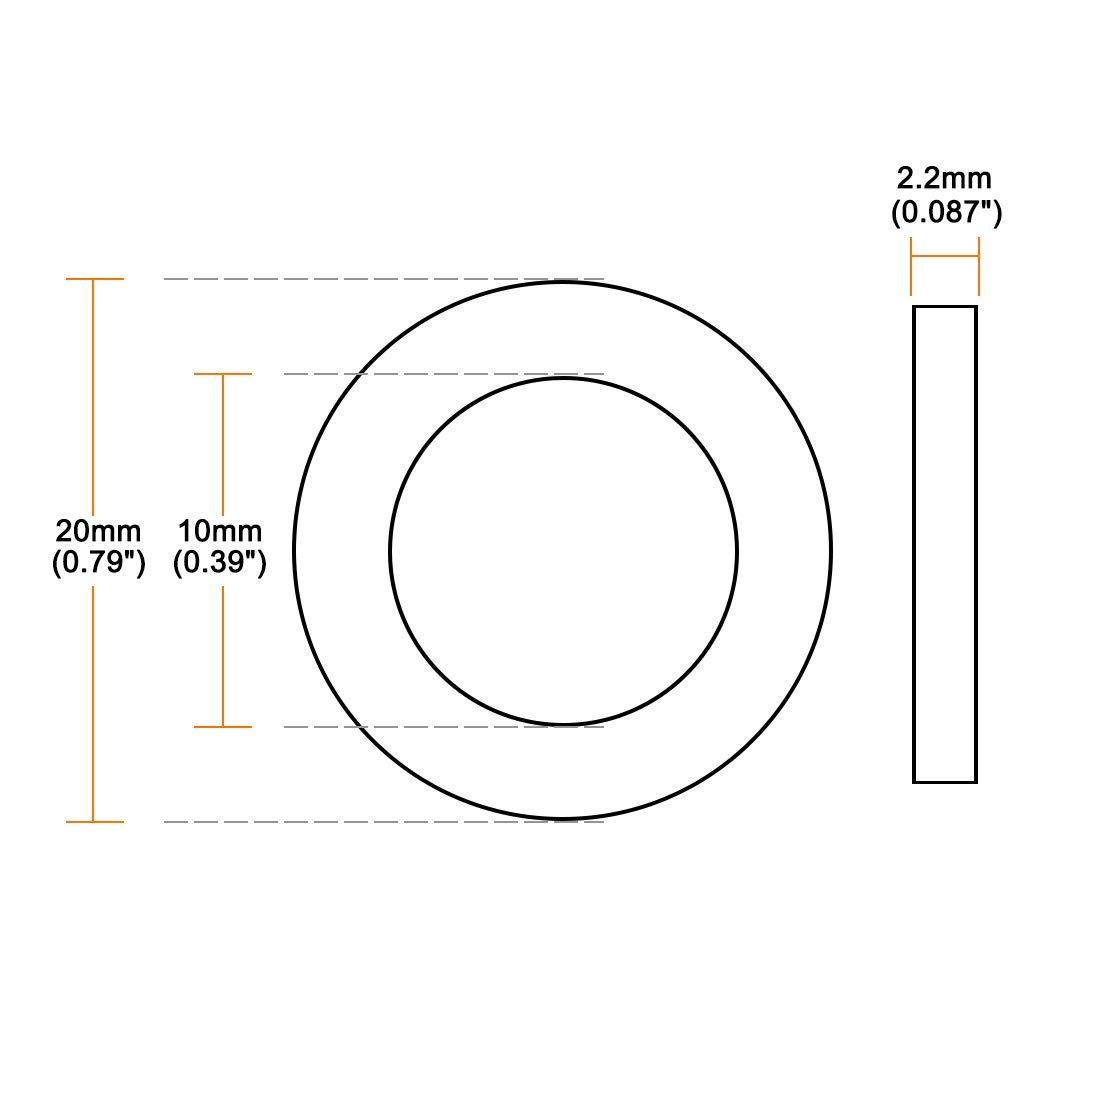 Arandelas planas de goma 10 mm de di/ámetro interior 20 mm de di/ámetro exterior 2,2 mm de grosor 20 unidades